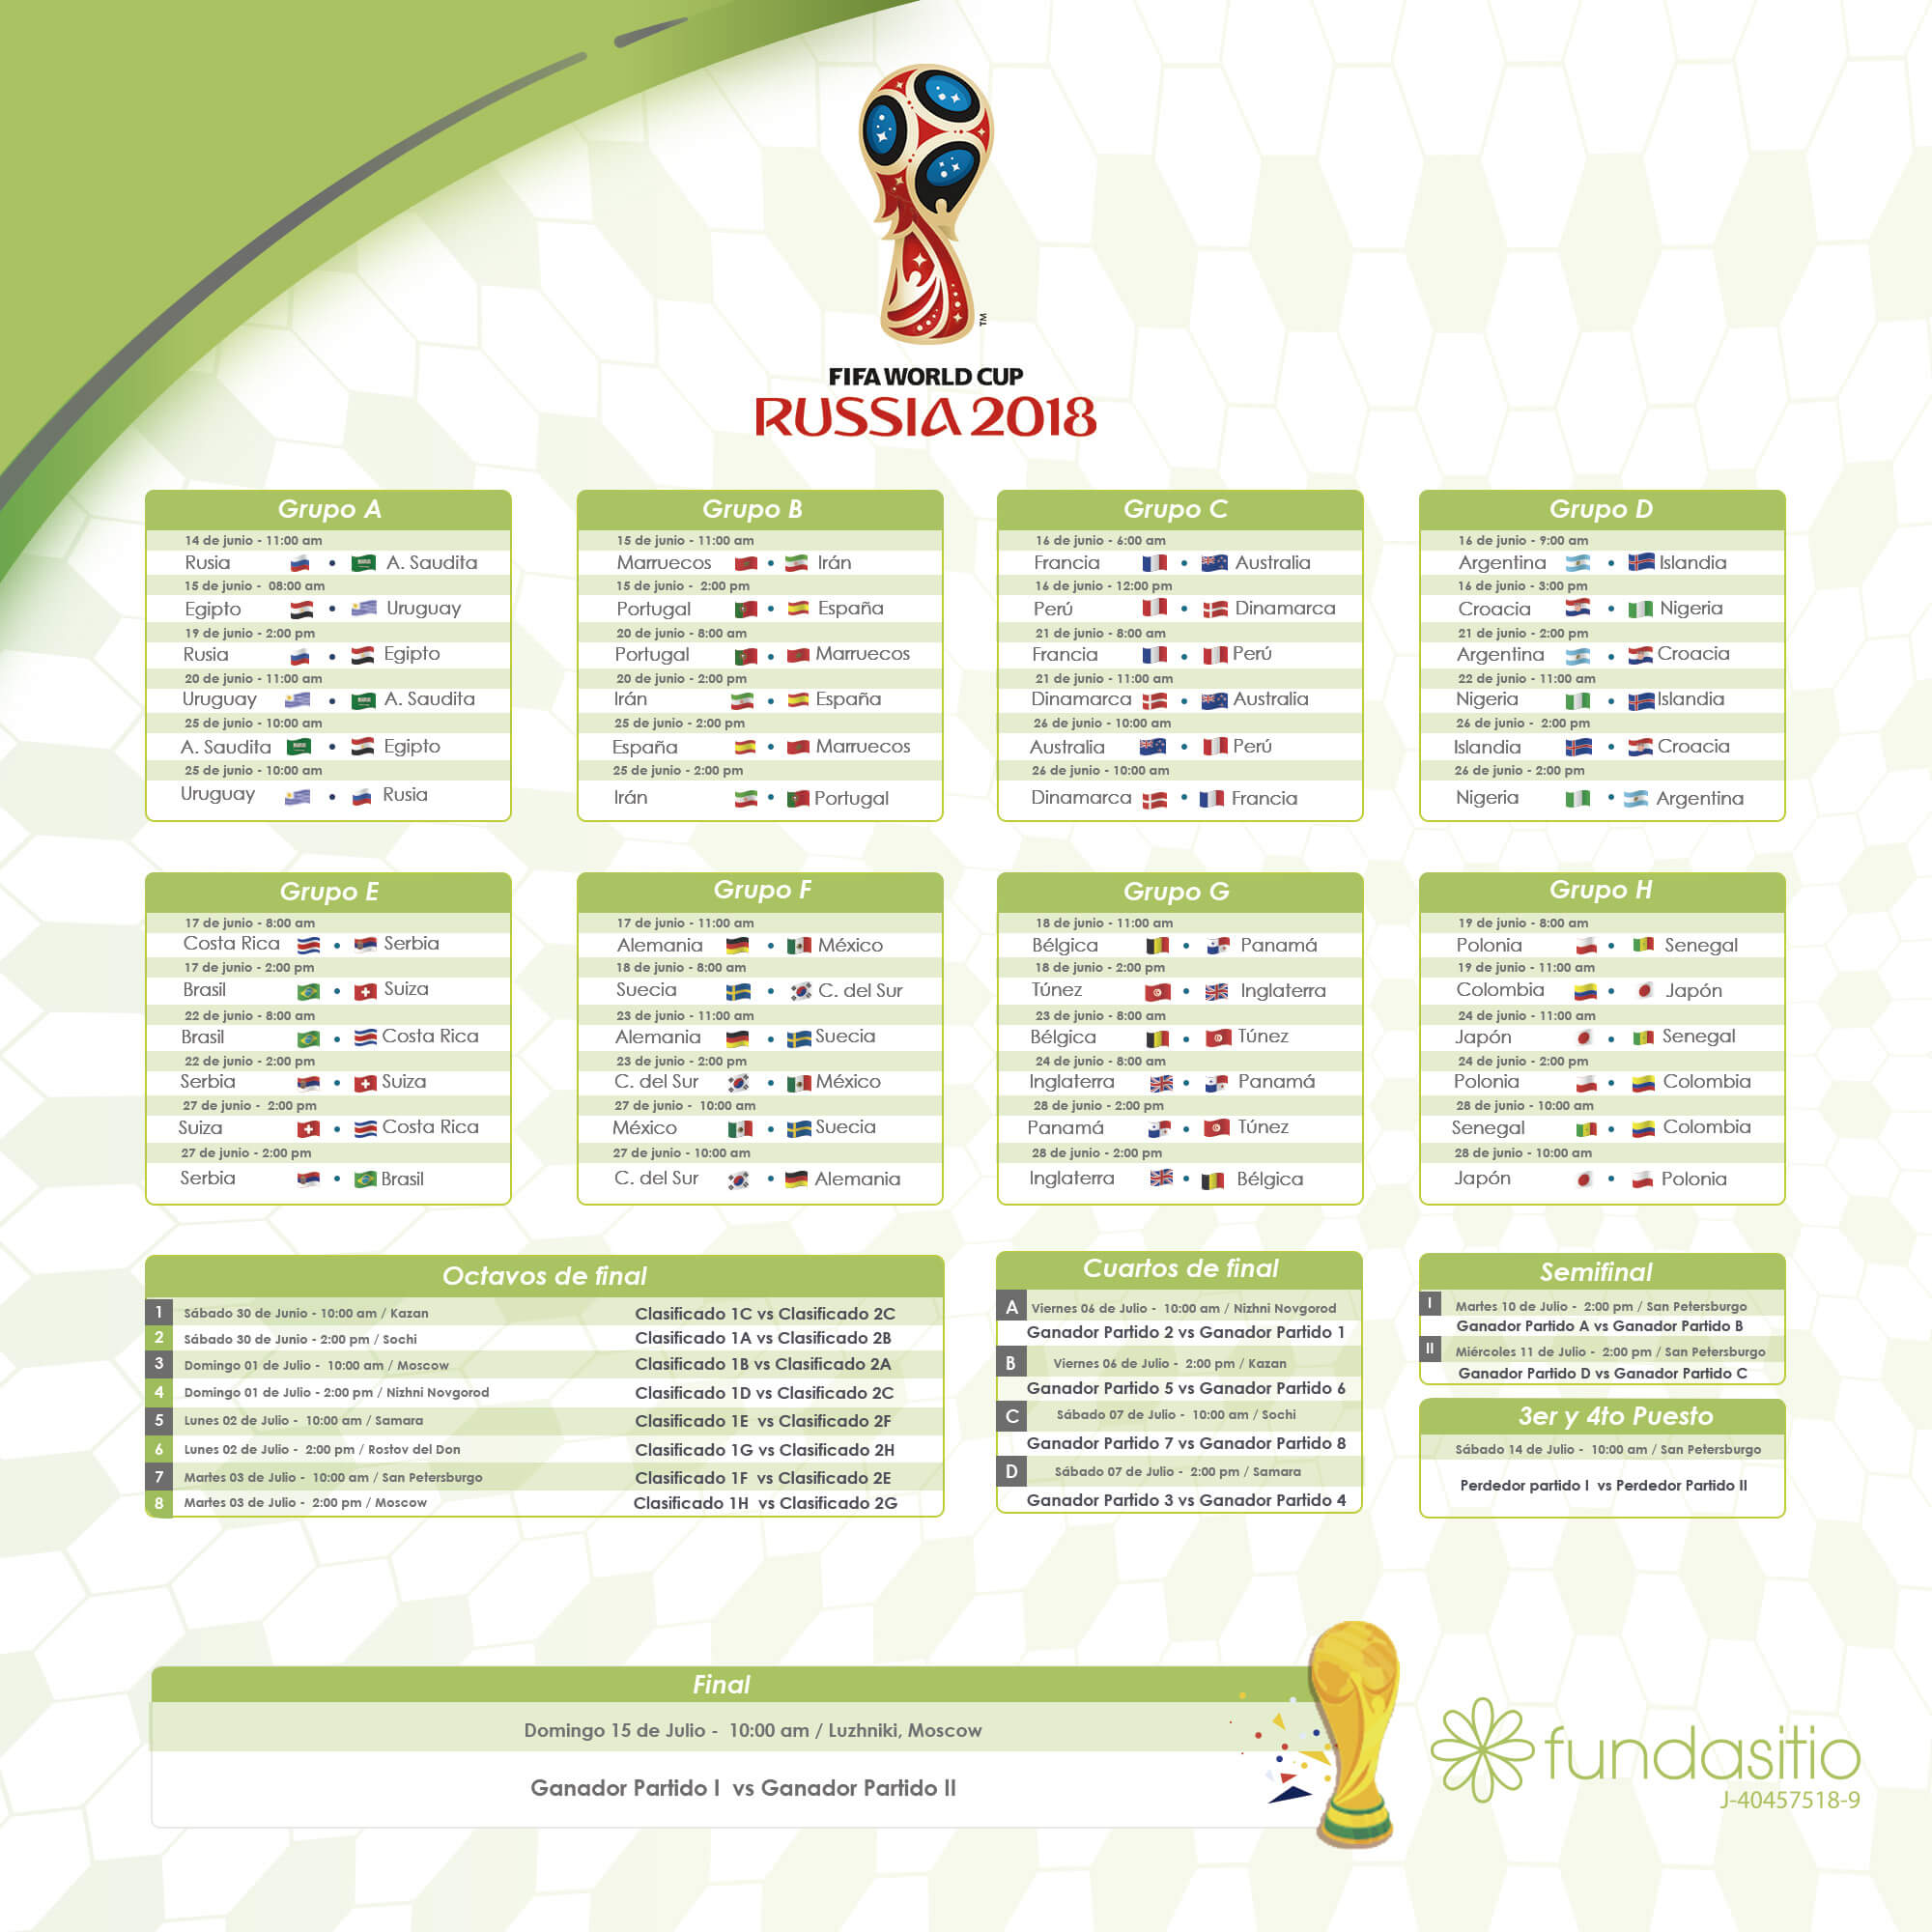 Calendario-Mundial-2018-Fundasitio